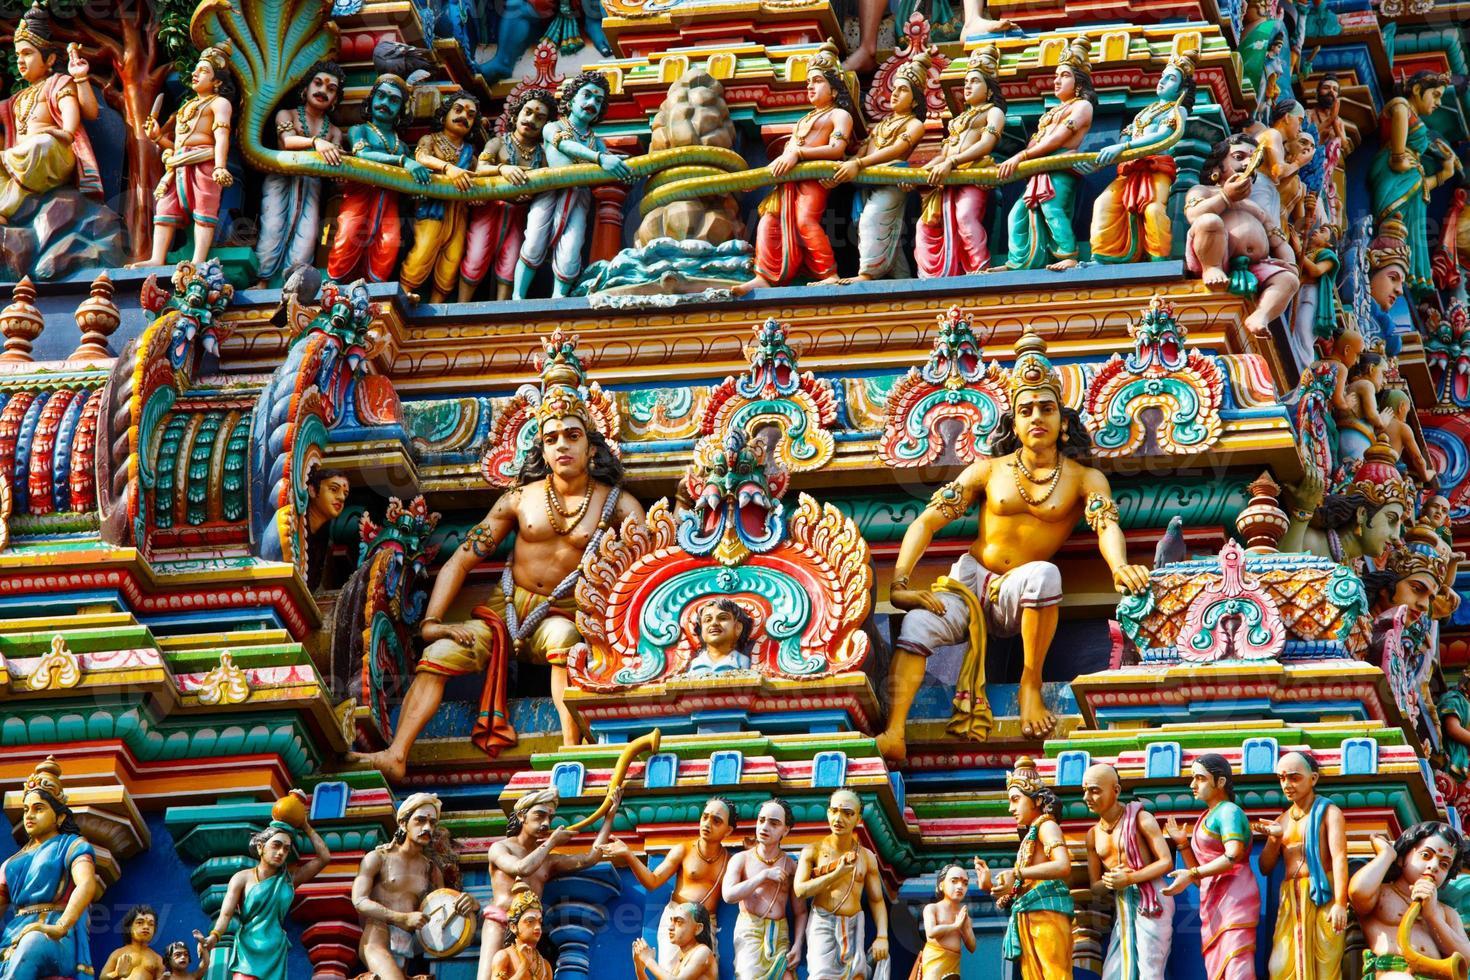 torre colorata gopuram del tempio indù foto